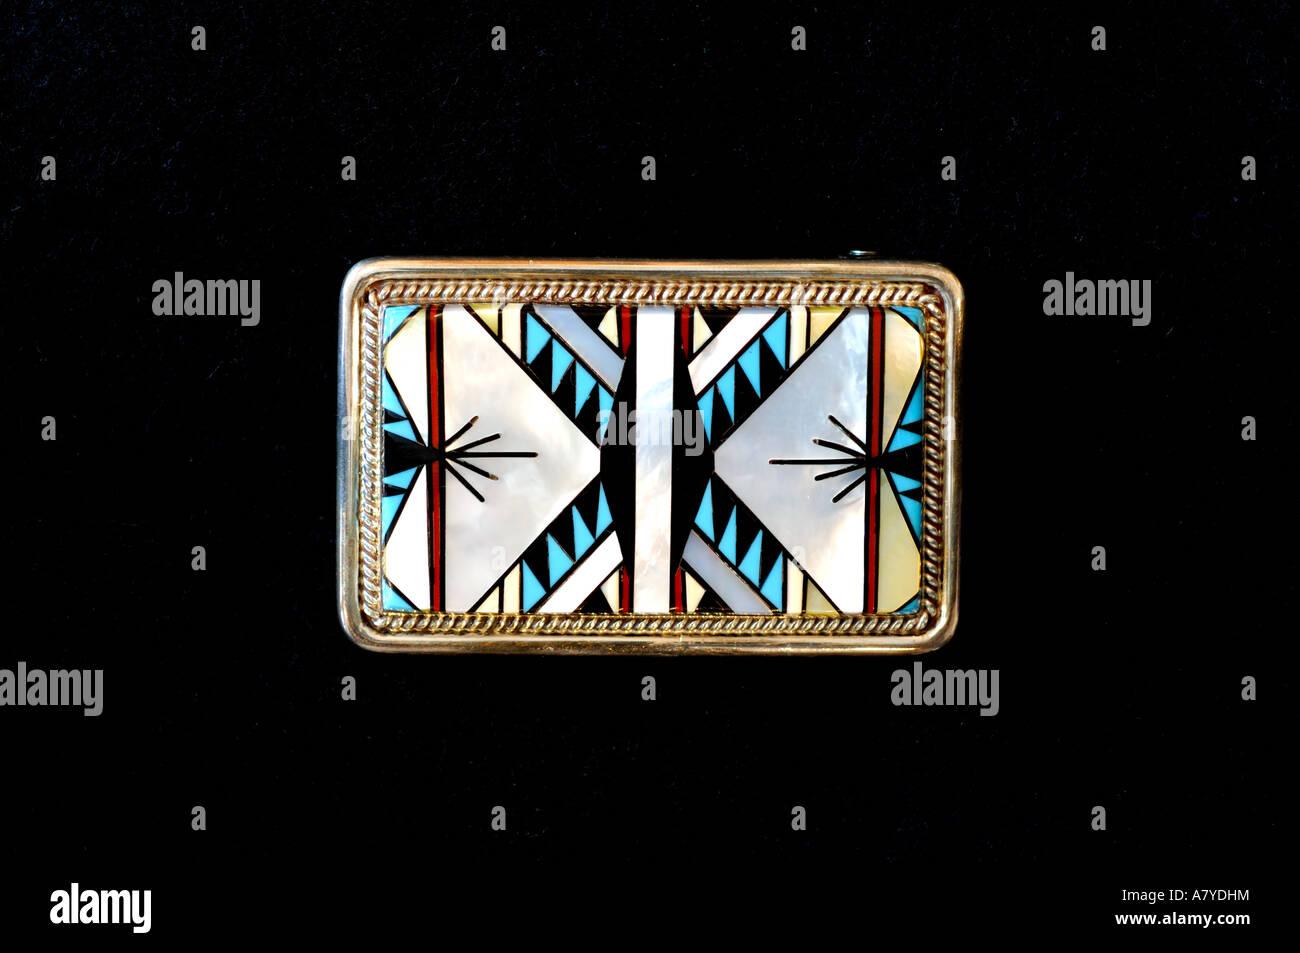 Southwest, American Indian art & handicrafts. Classic Zuni inlay belt buckle, blanket pattern. Property release. Stock Photo